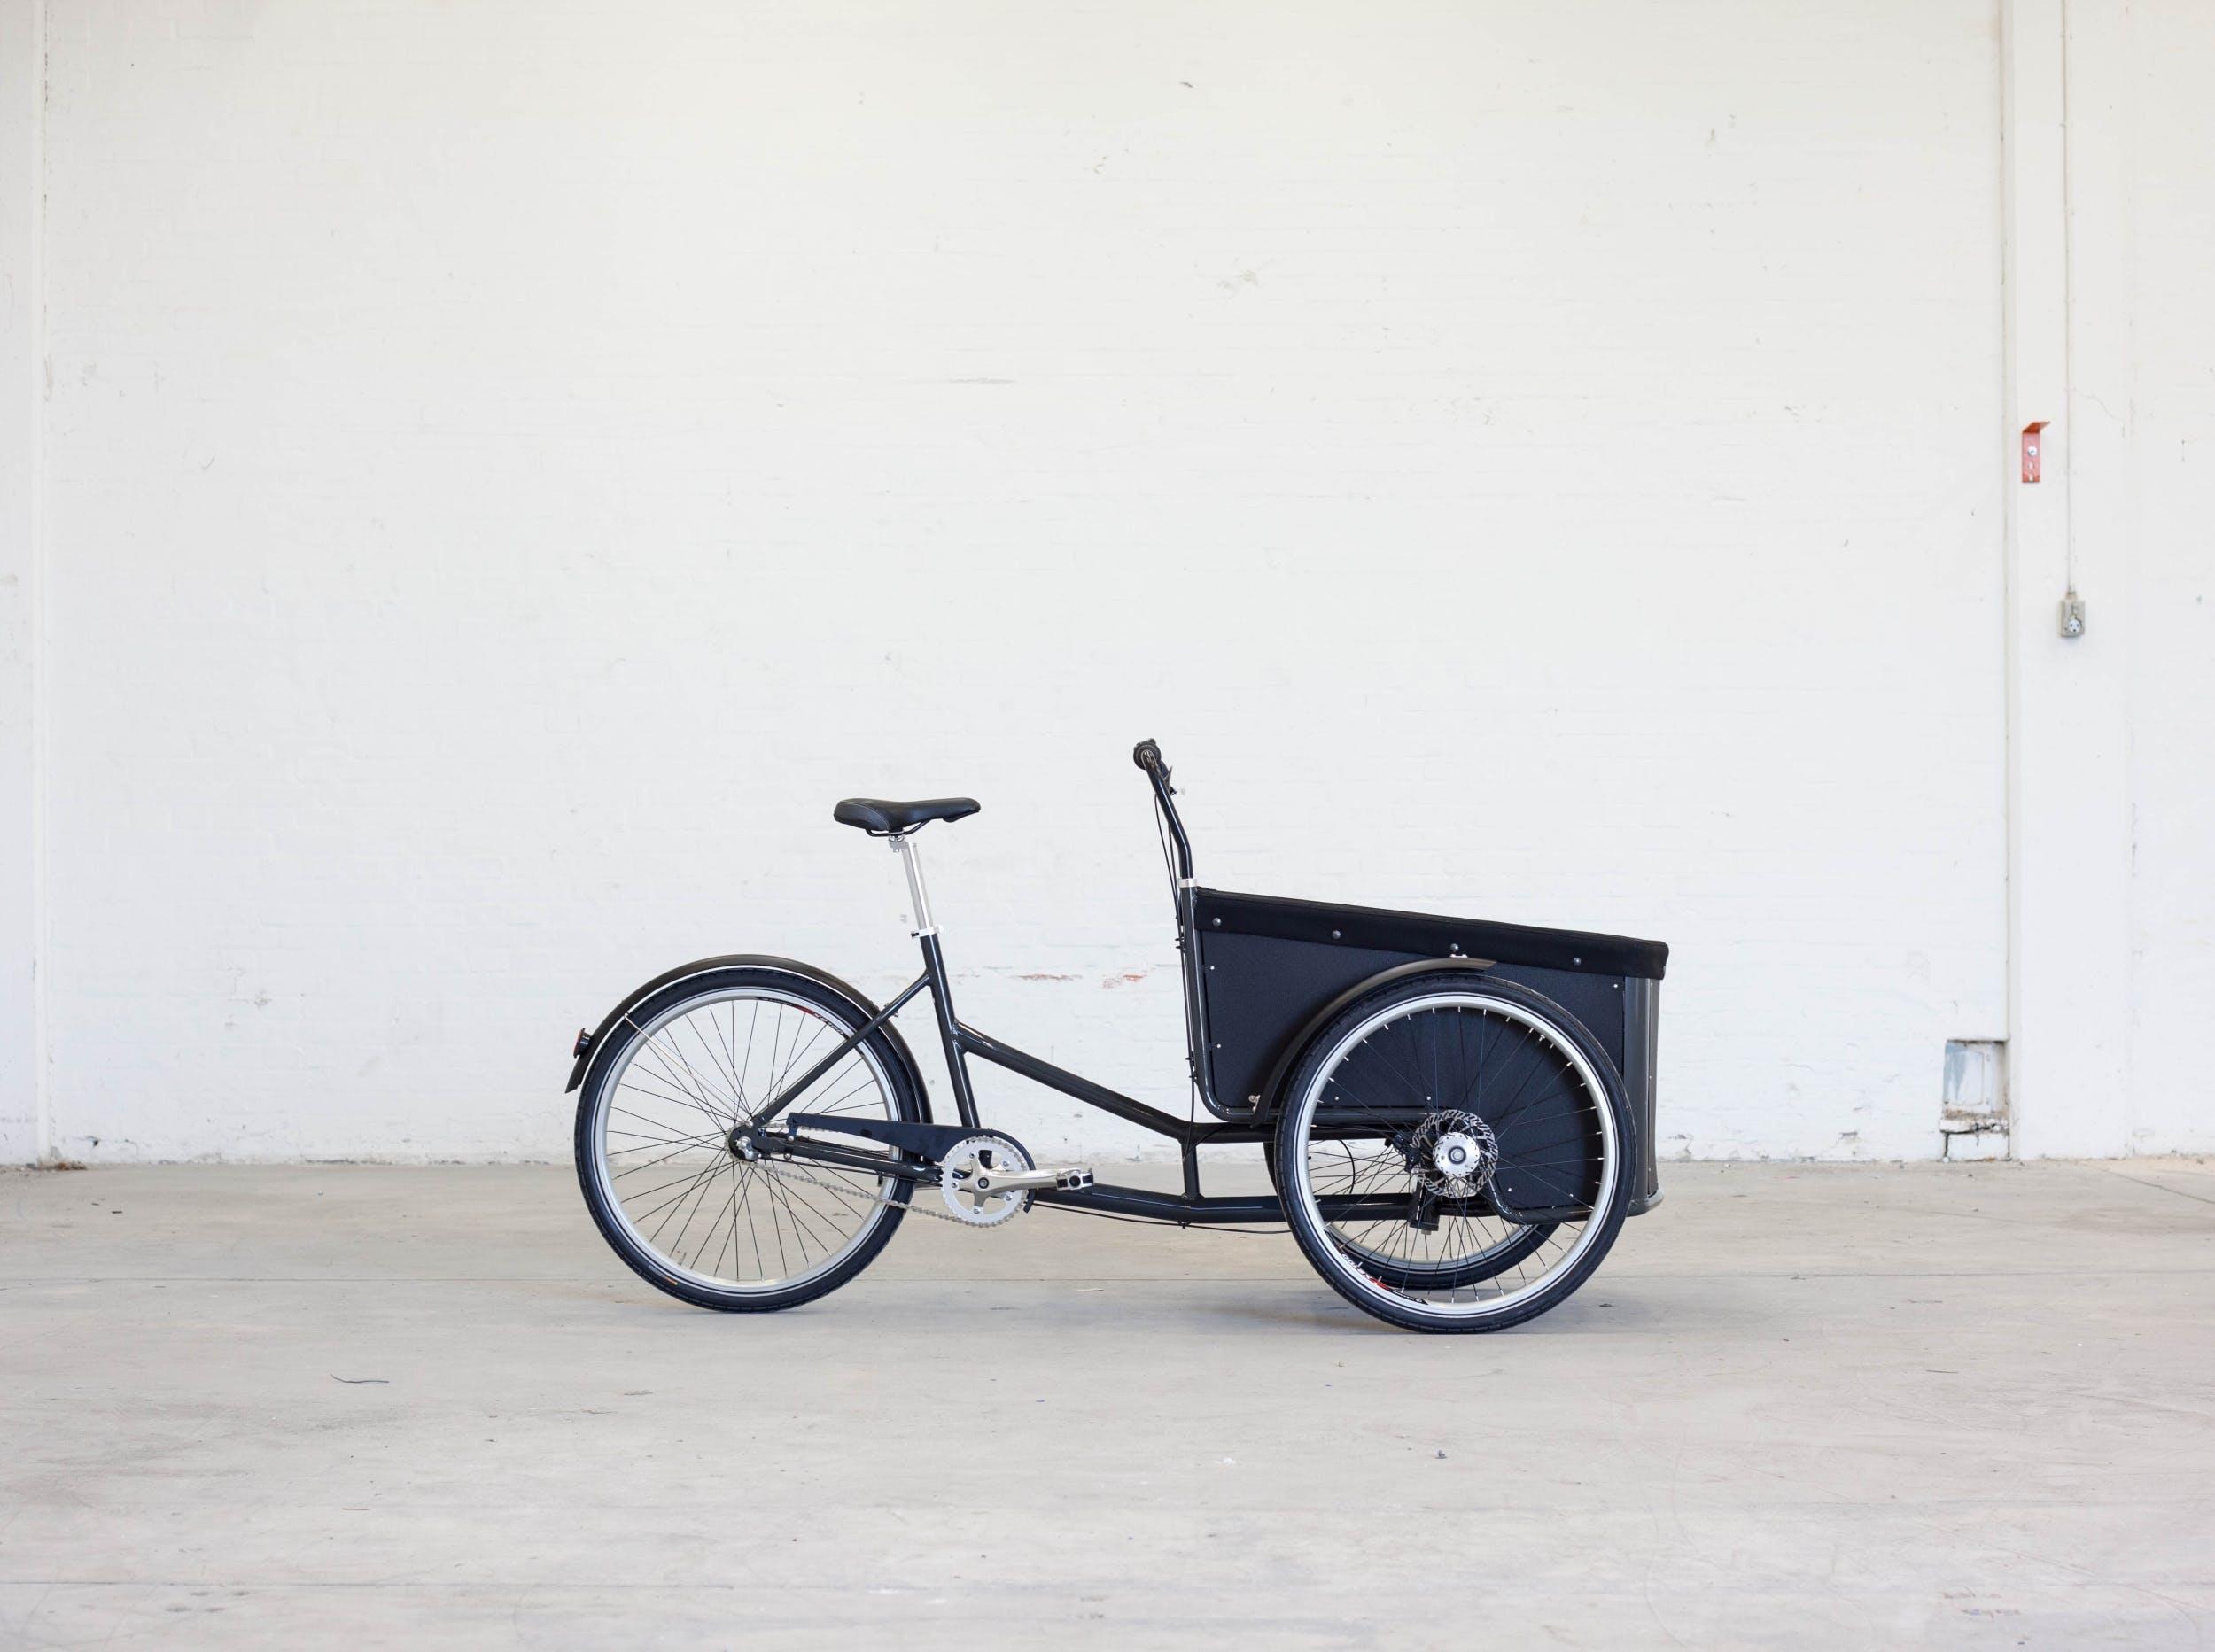 bicikli, biciklizés, fal